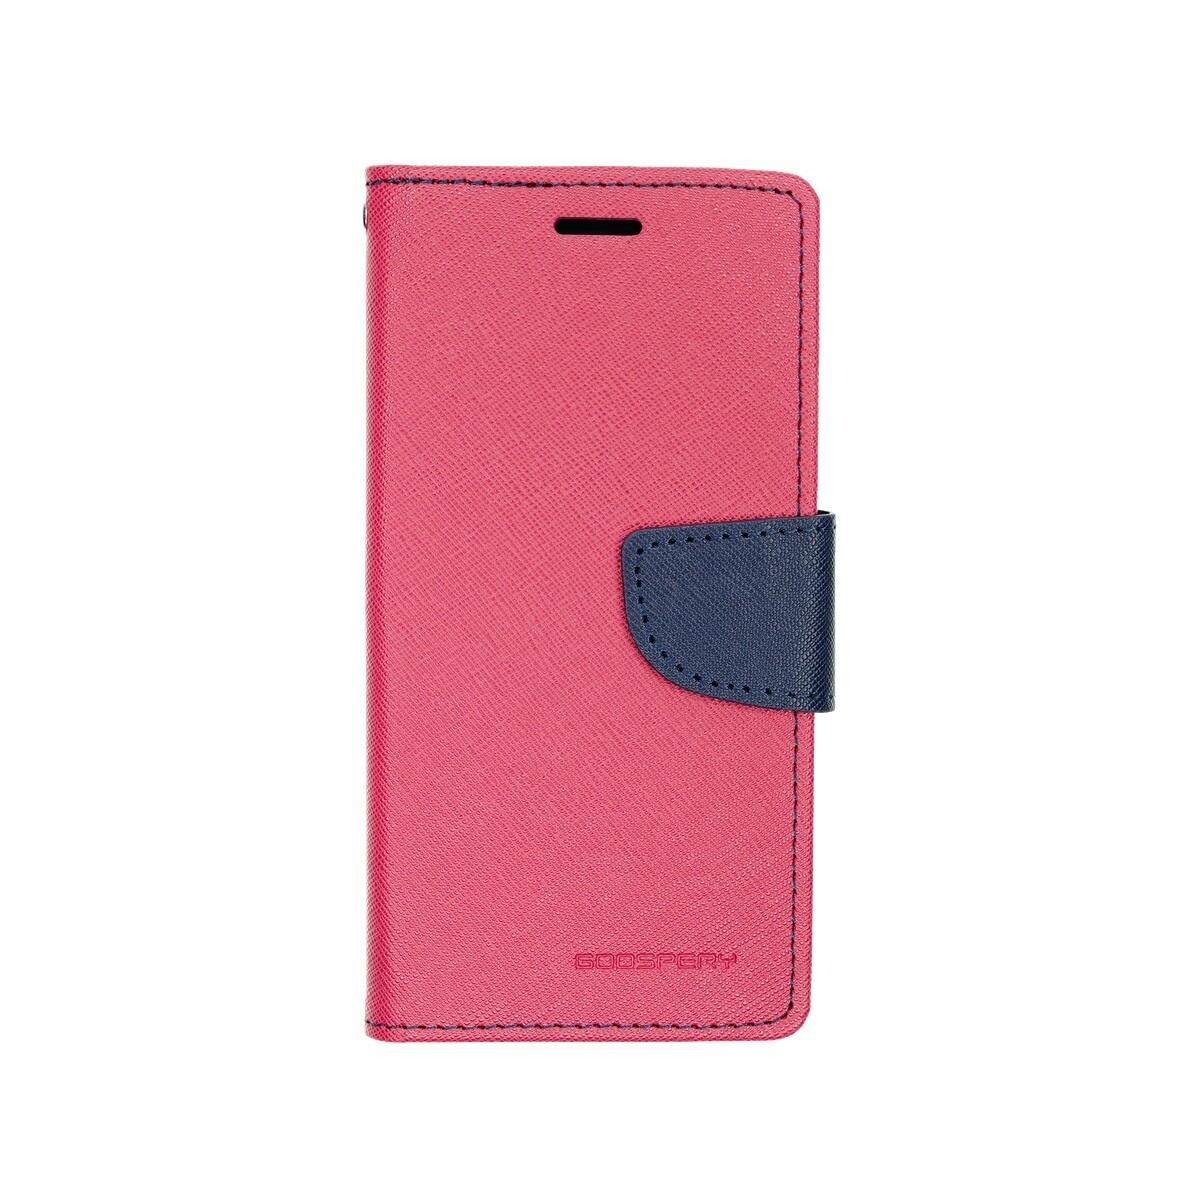 Estuche GOOSPERY Fancy Diary  Fucsia/Azul Marino SAMSUNG S10